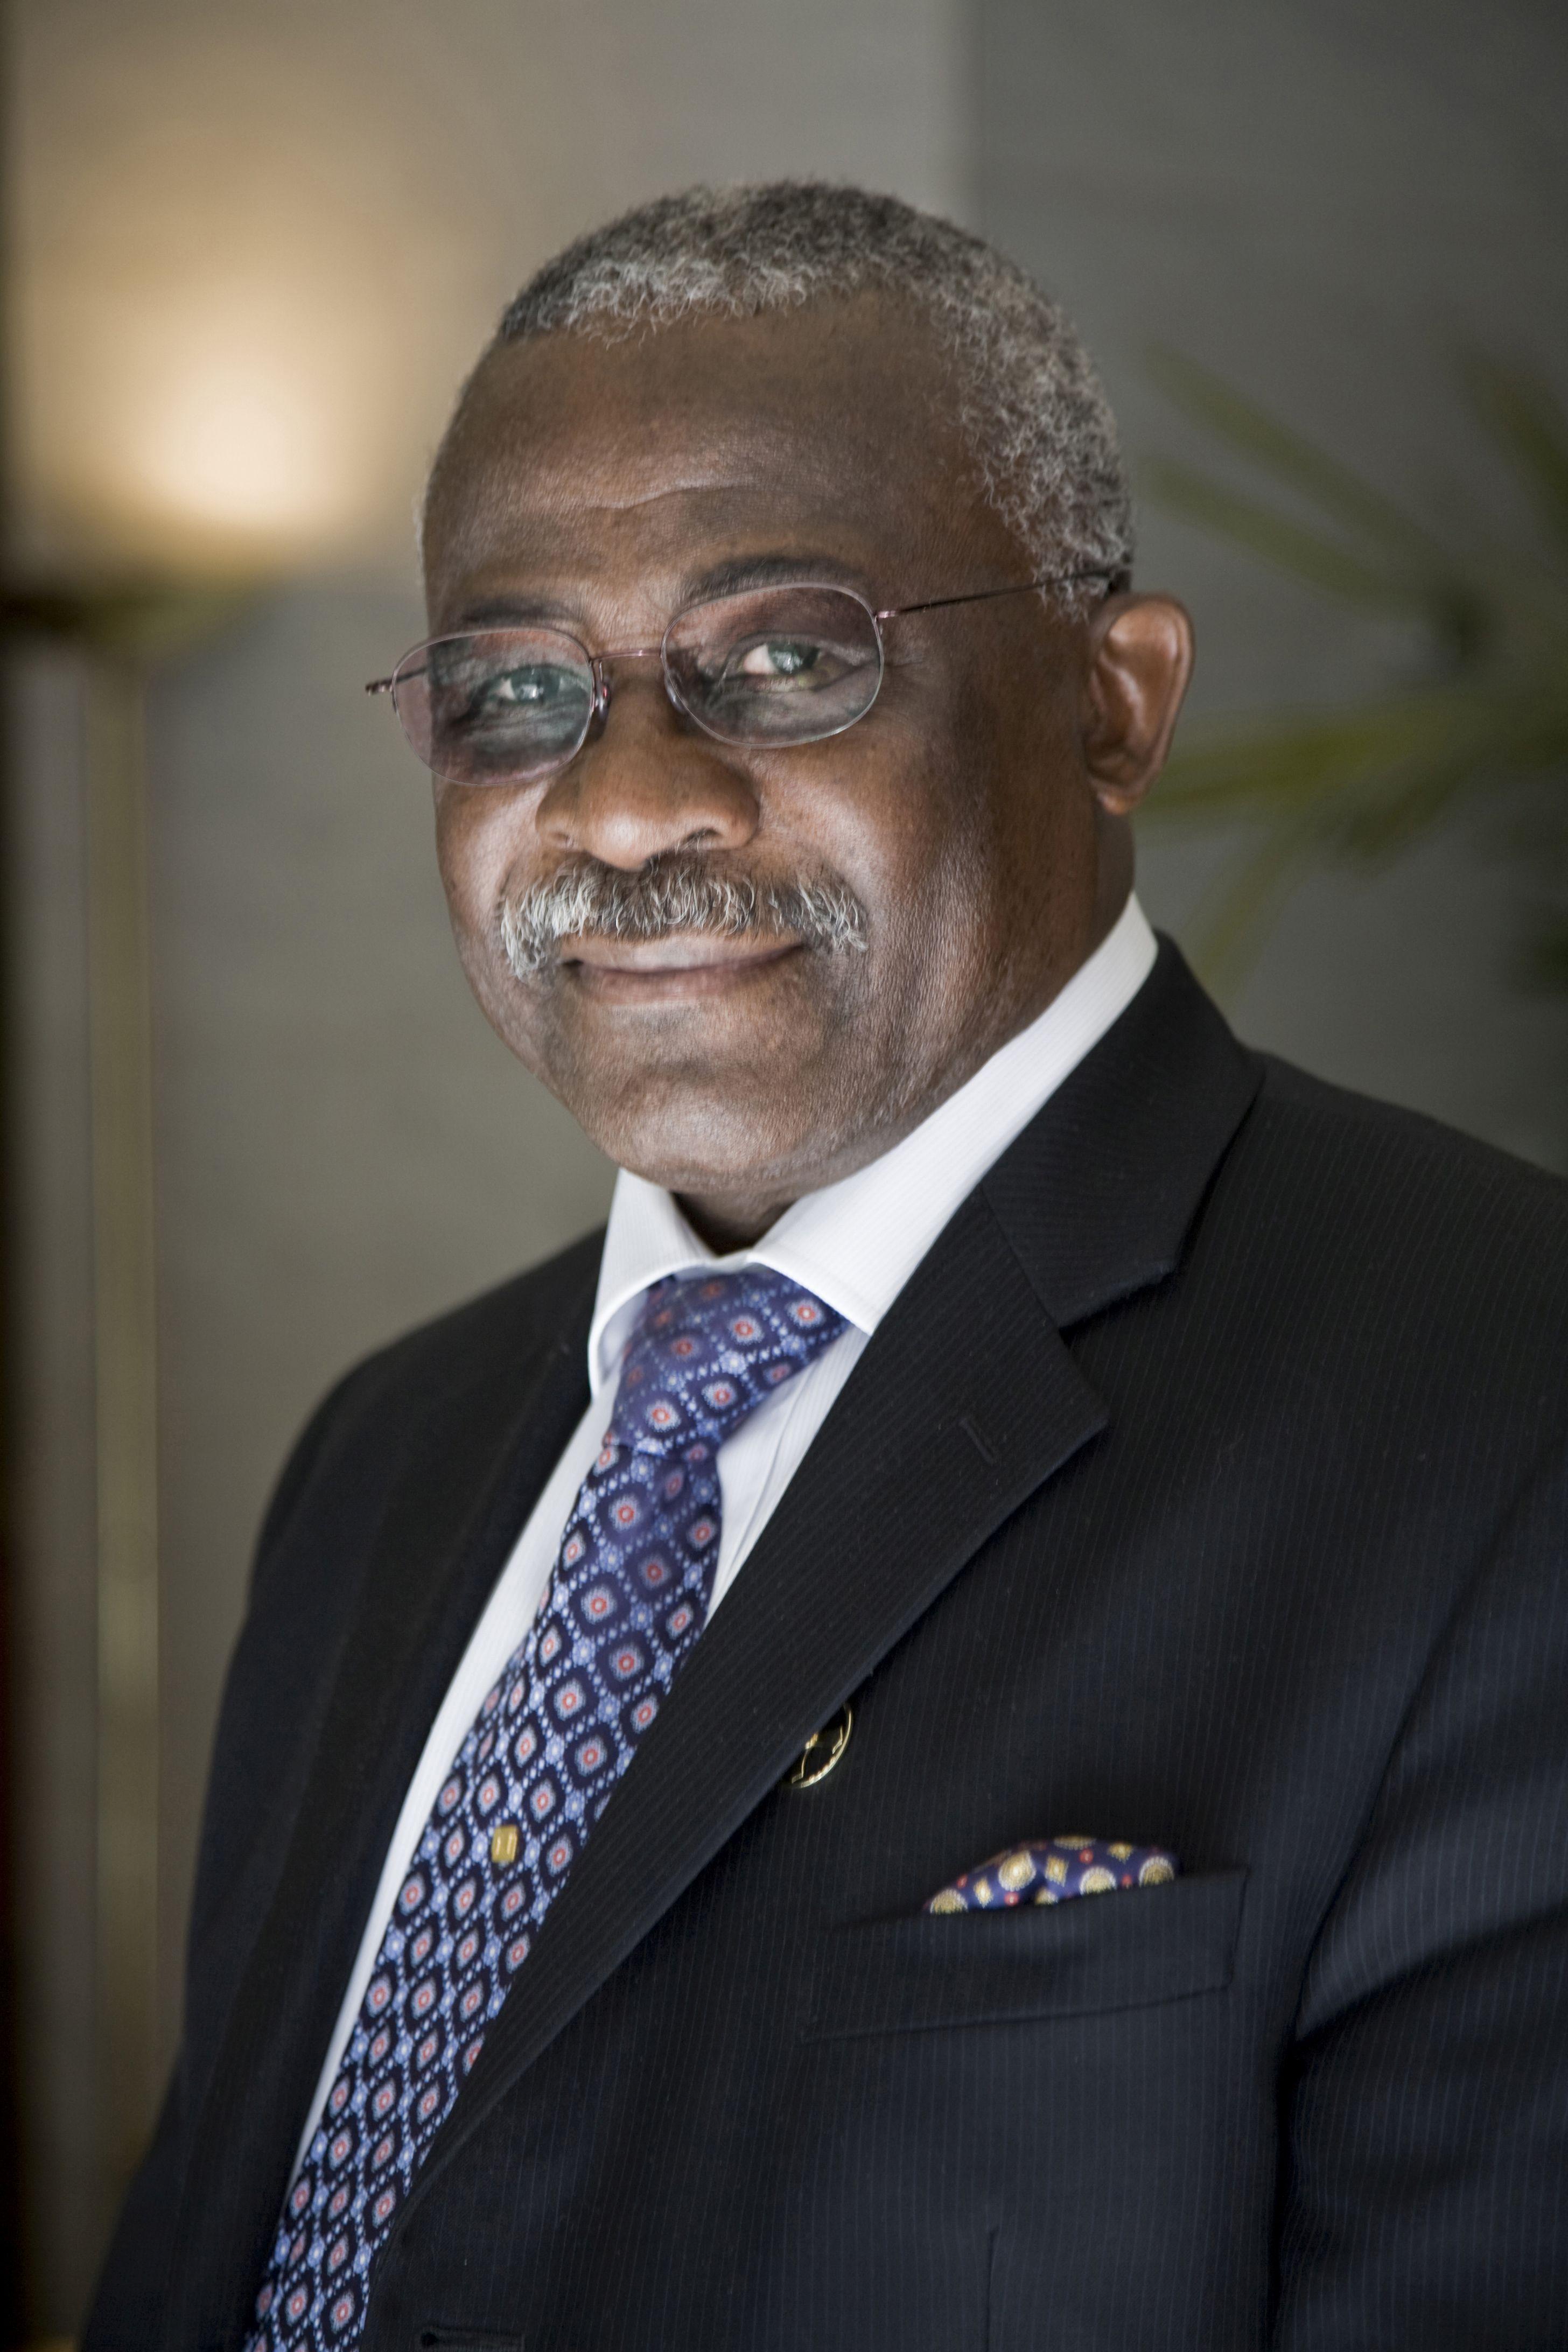 Spain; Visit in Spain of president Kanayo F. Nwanze 26 April 201